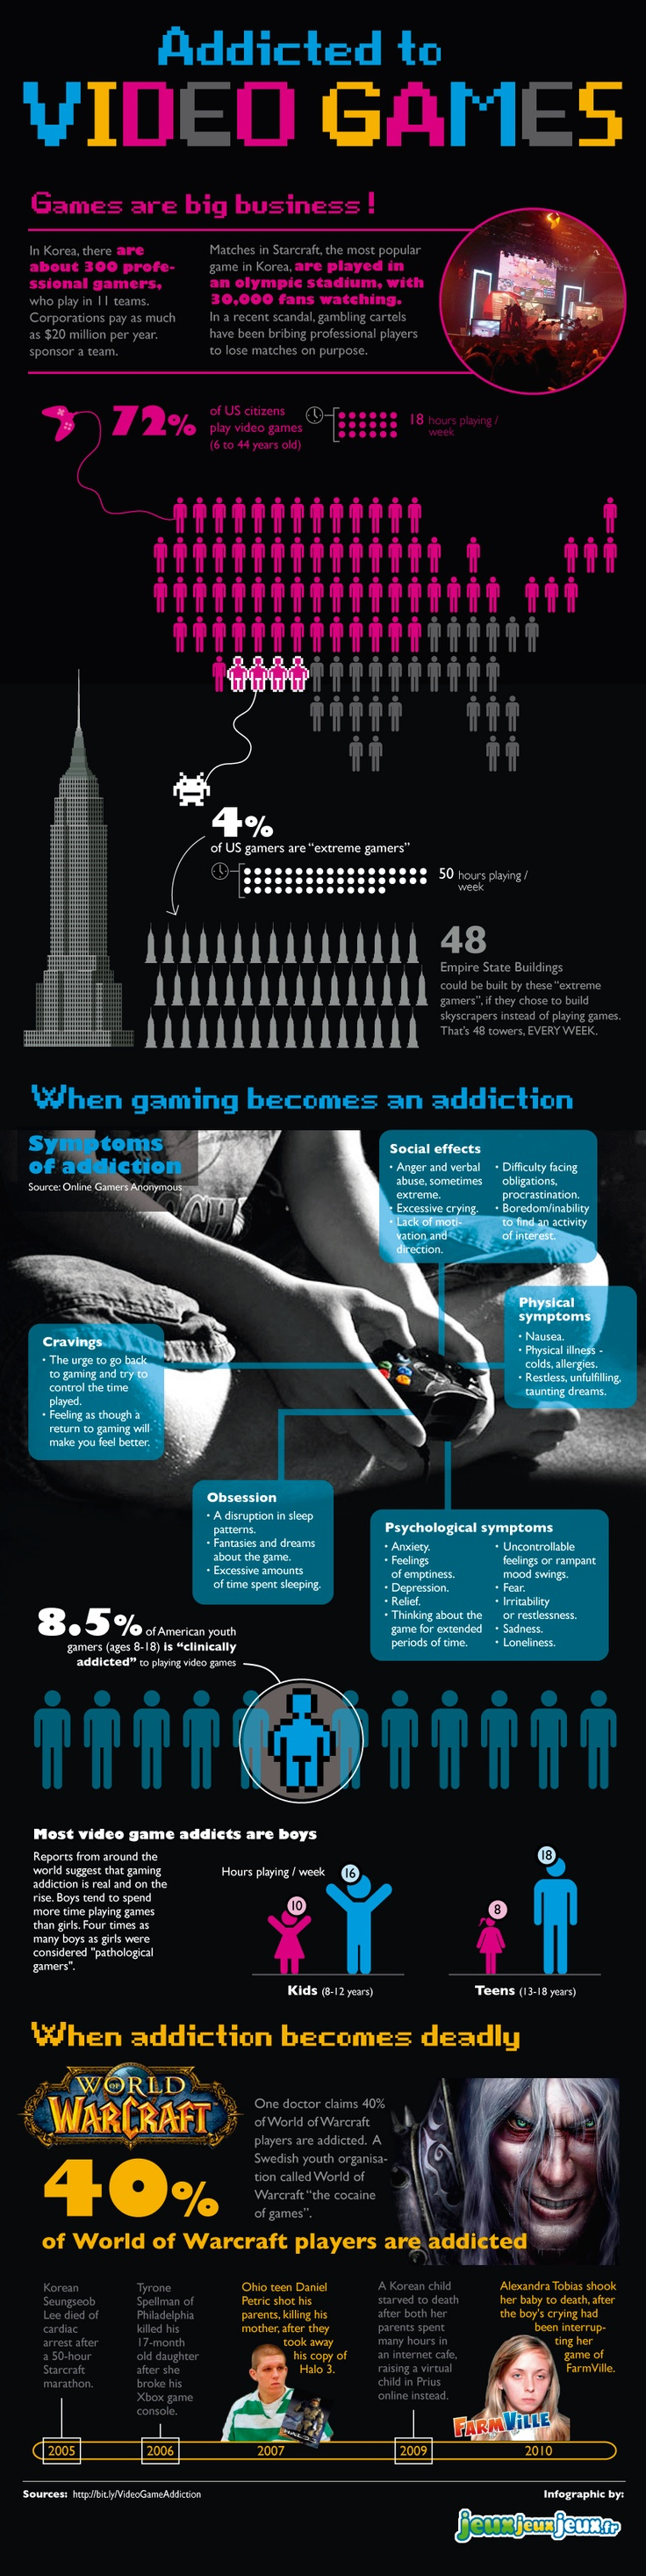 Video game addiction by Toca dos Jogos